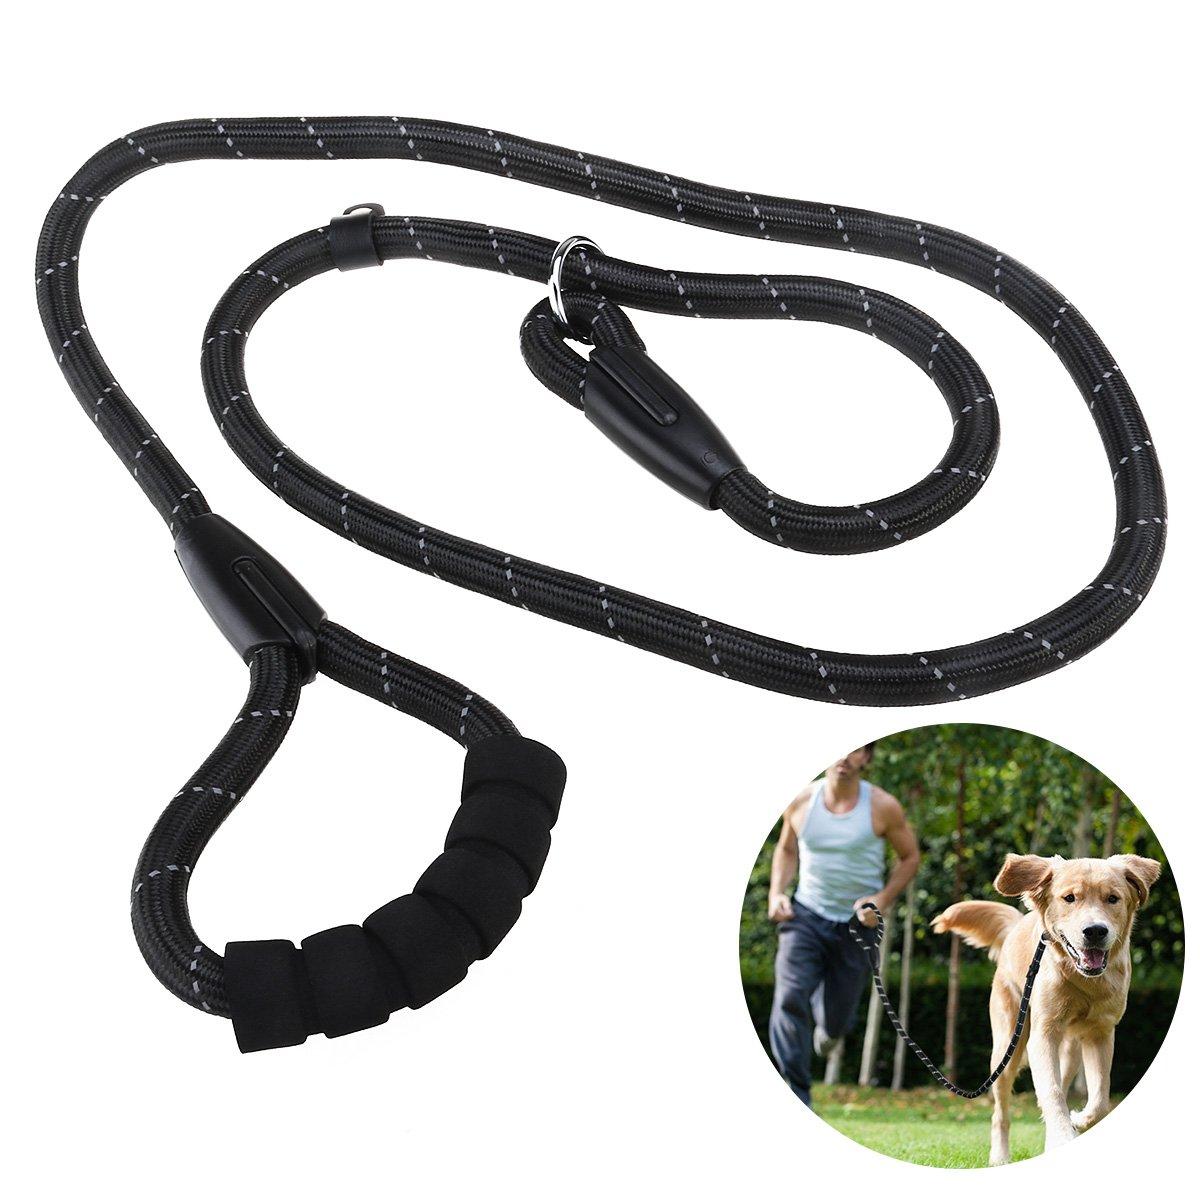 UEETEK Dog Slip Collar Choke Leash P-Leash Reflective Durable Training Rope Sponge Handle Control for Running Walking Hiking